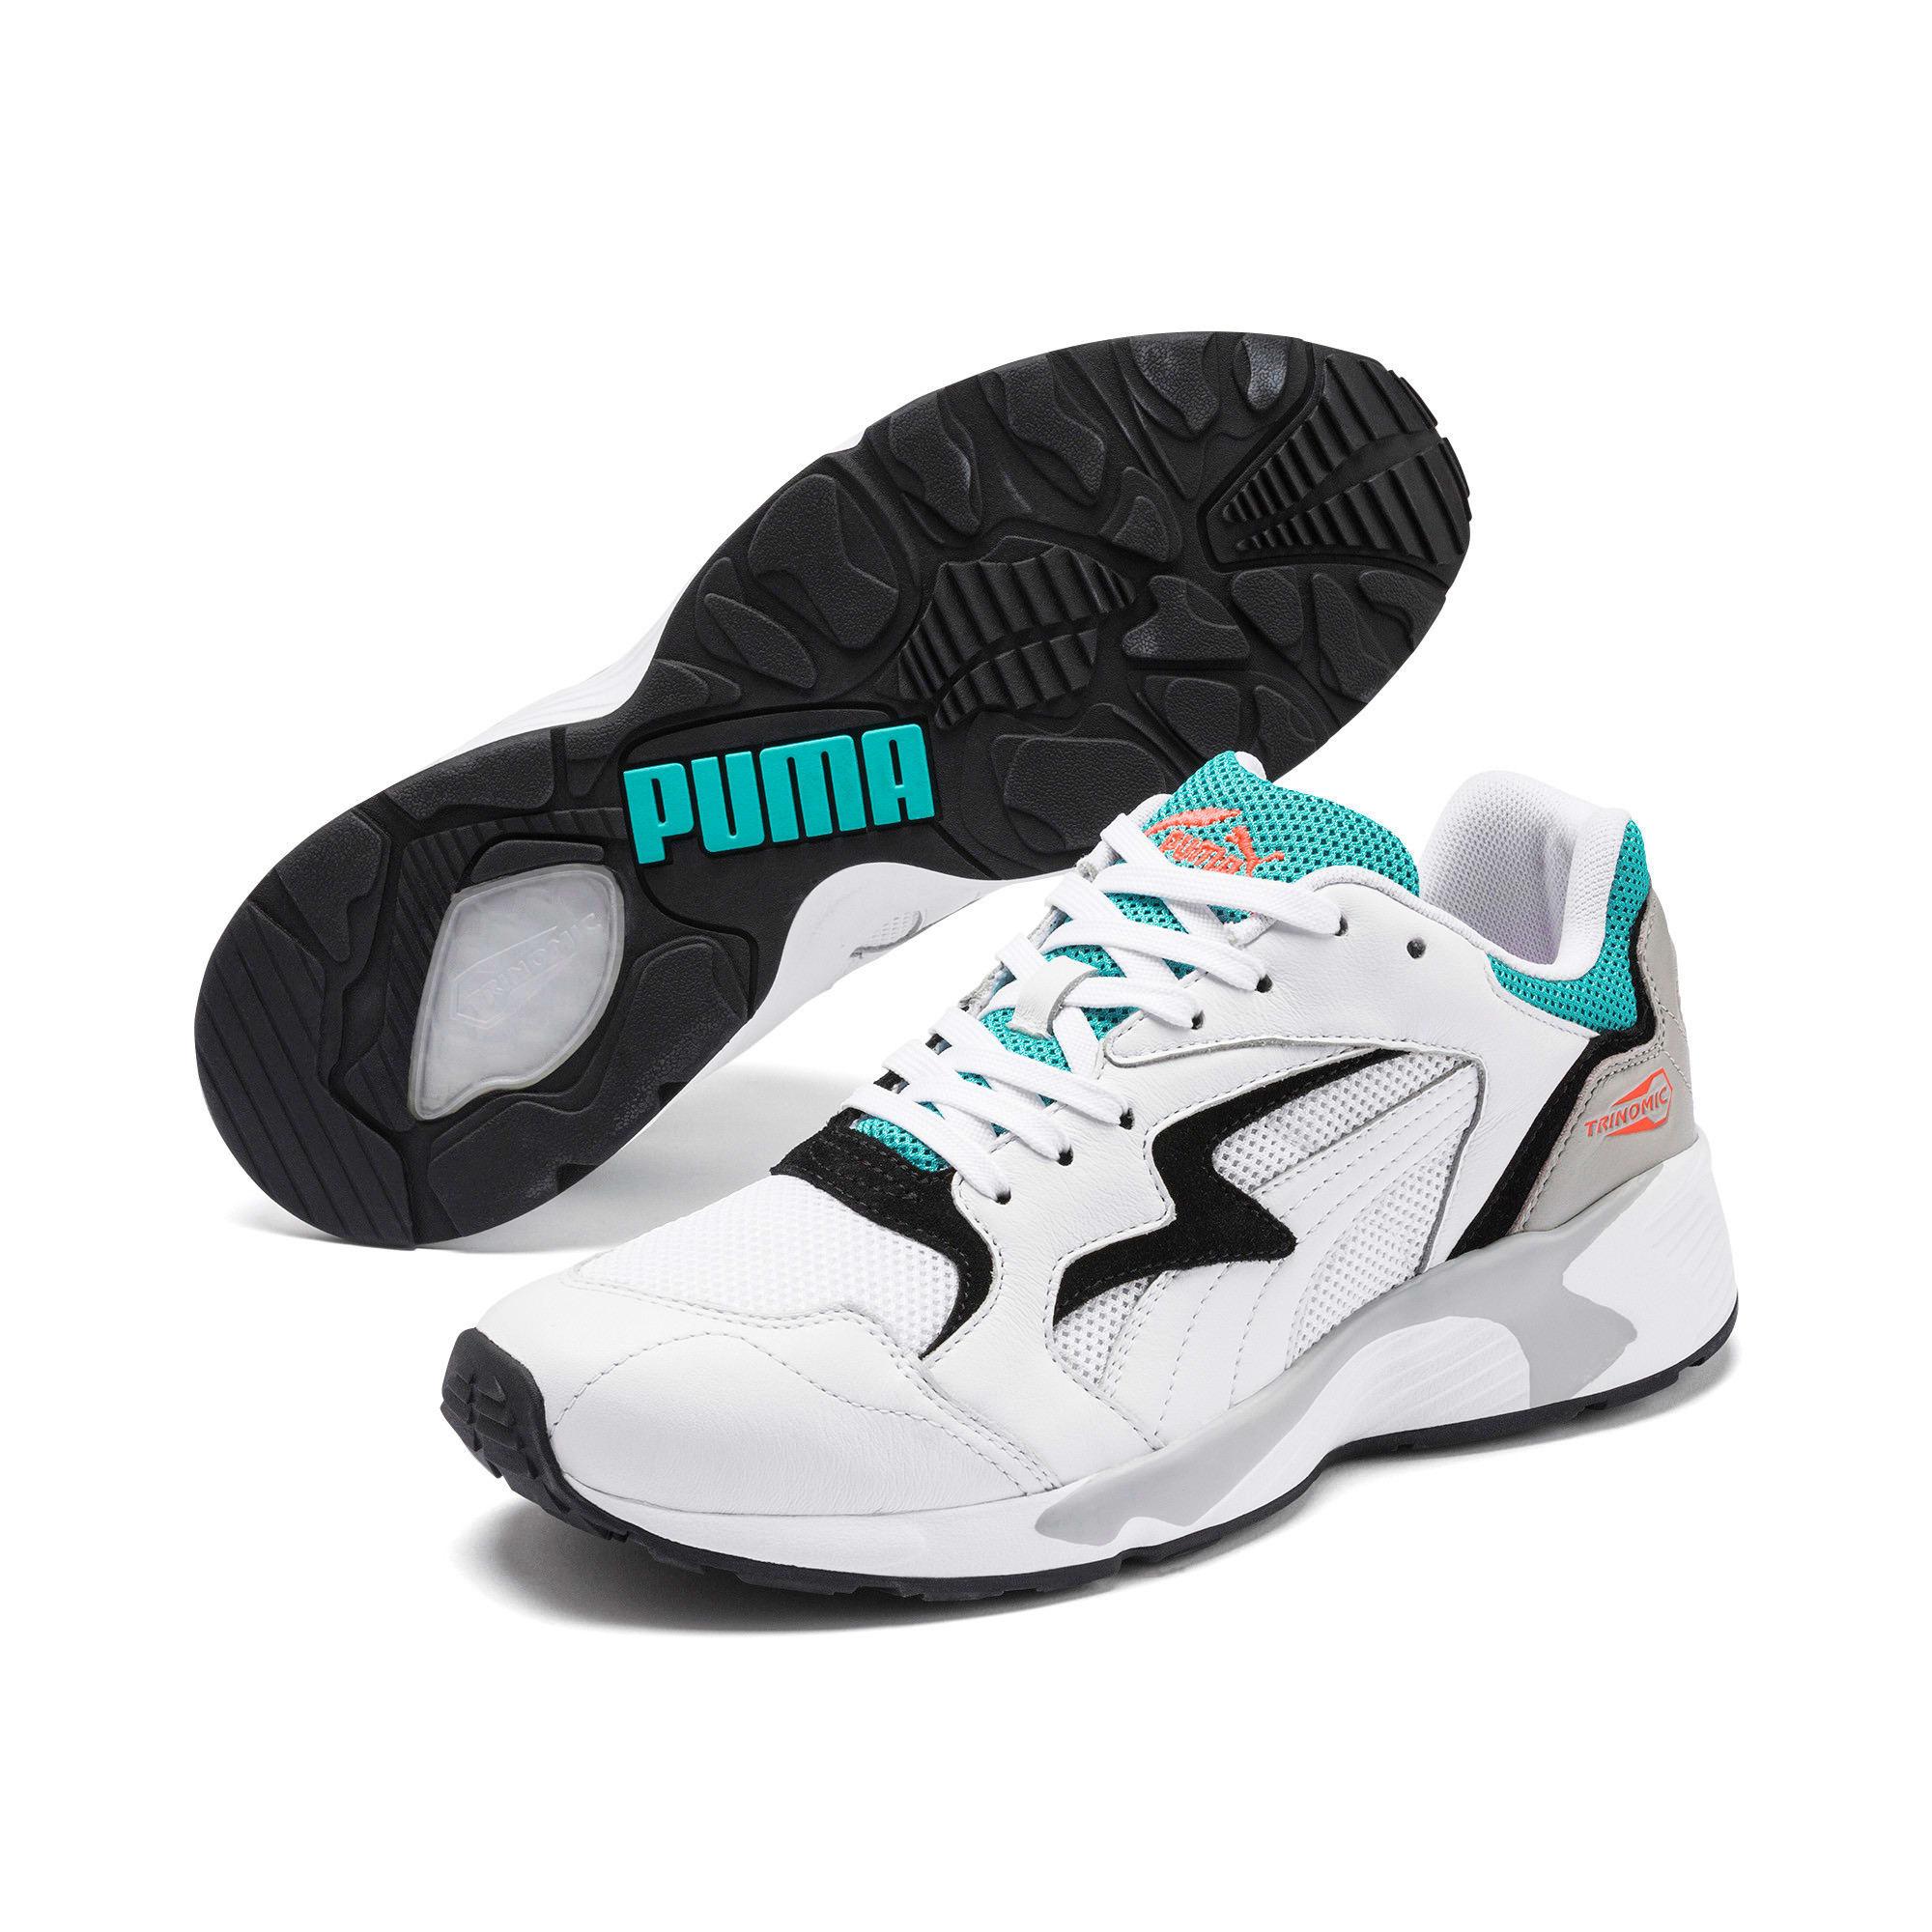 Thumbnail 2 van Prevail Classic sportschoenen, Puma White-blauw turquoise, medium